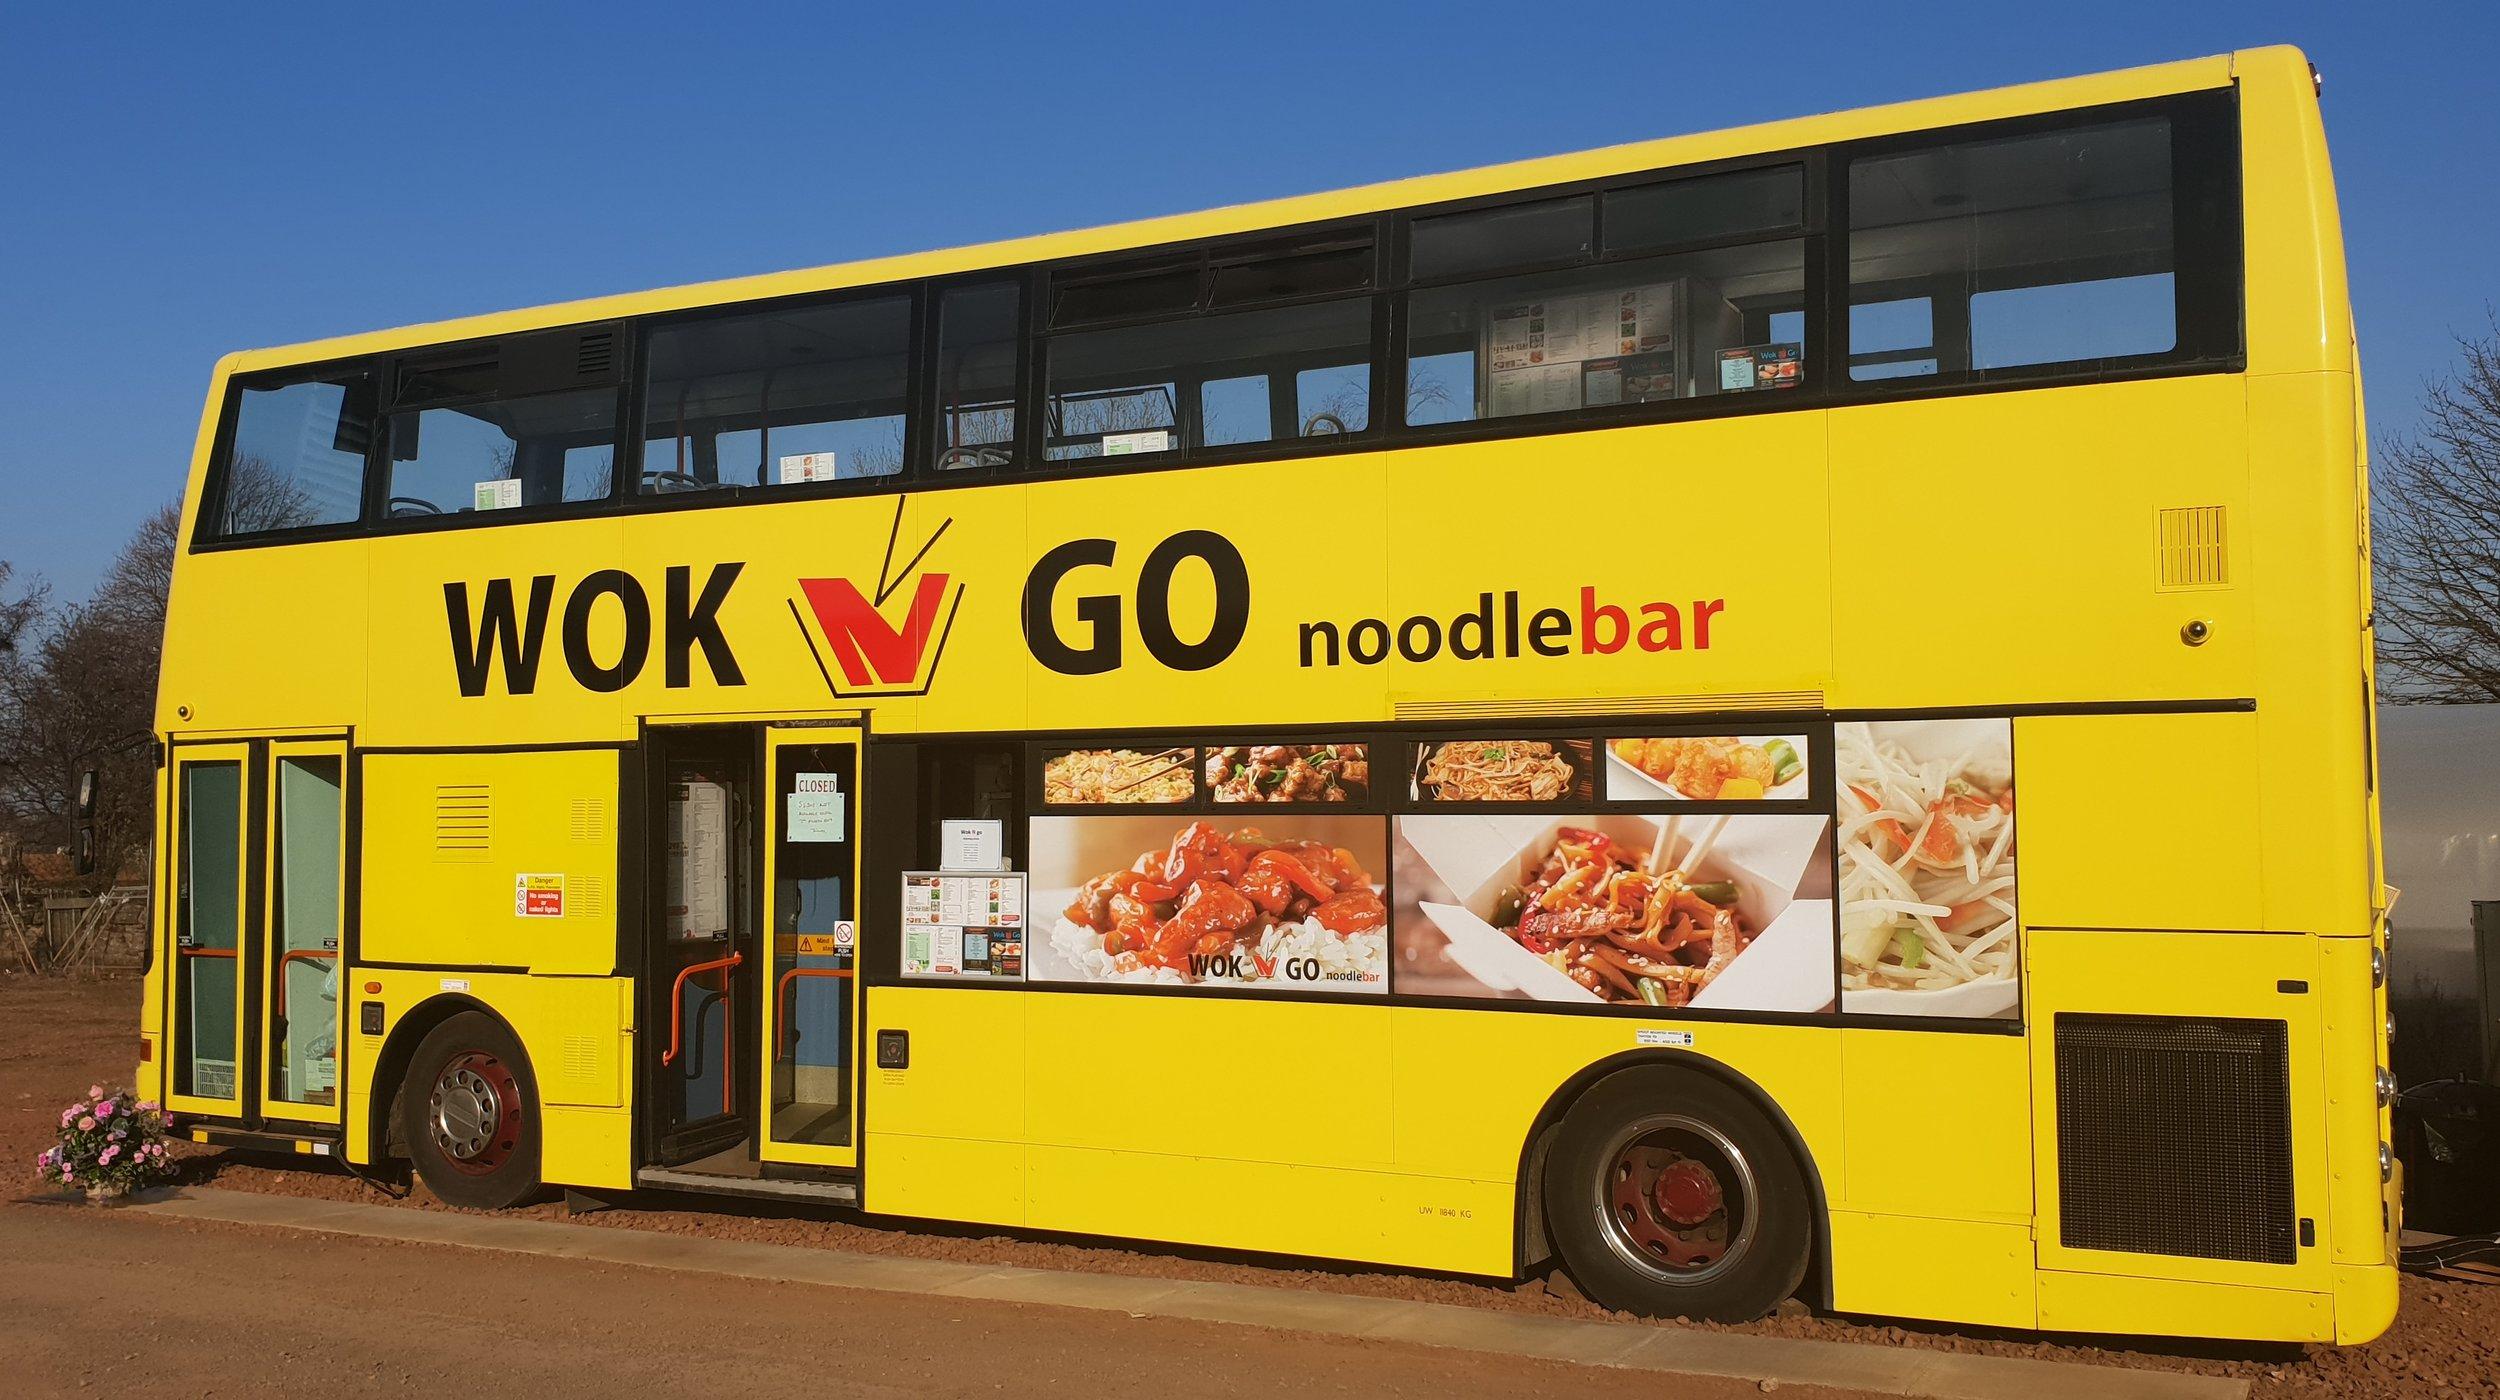 Wok N Go - Noodle Bar